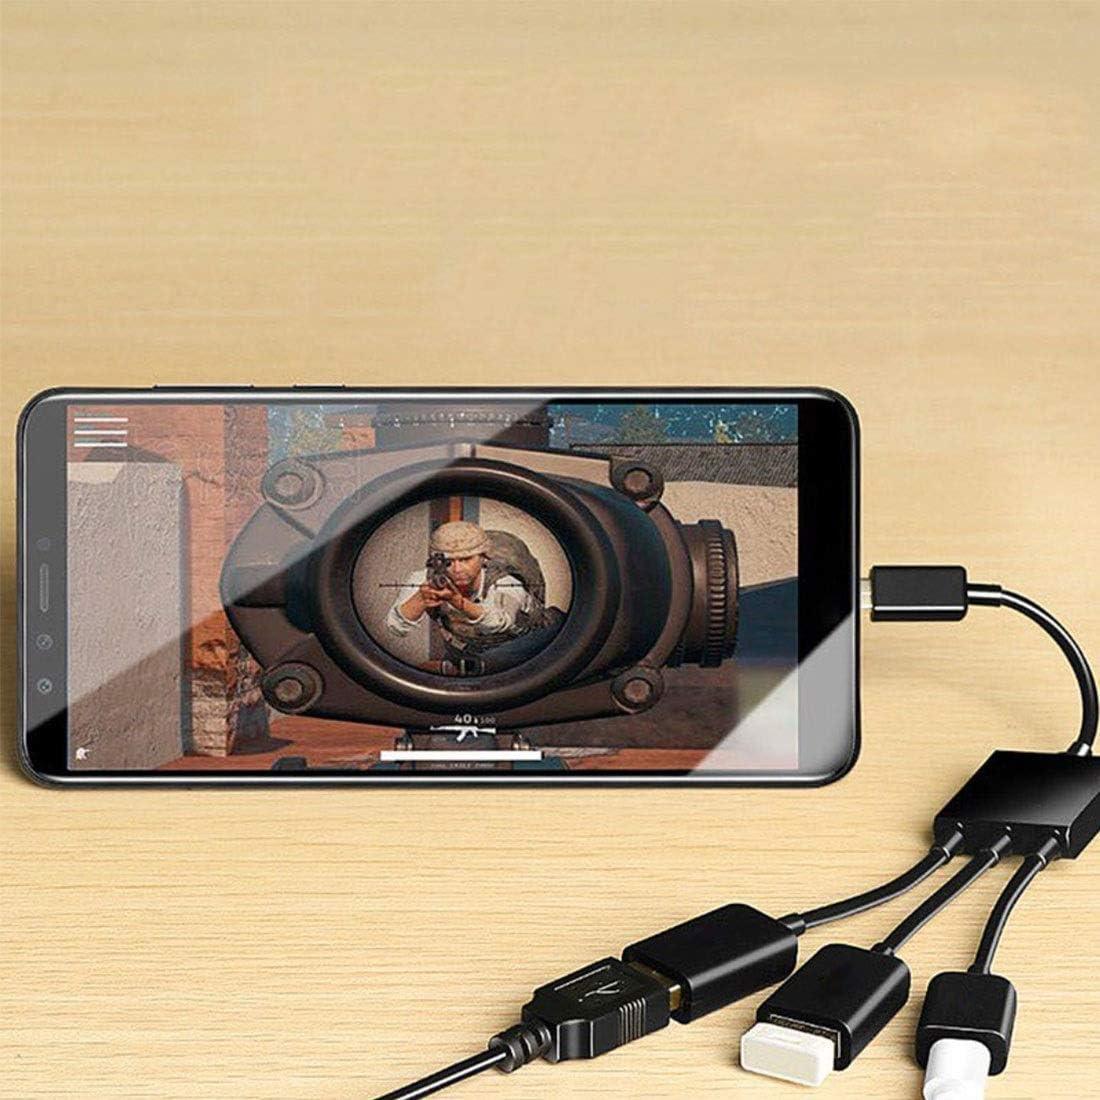 Color : Black 3 x USB 2.0 Female to USB 2.0 Male HUB Adapter Durable Black